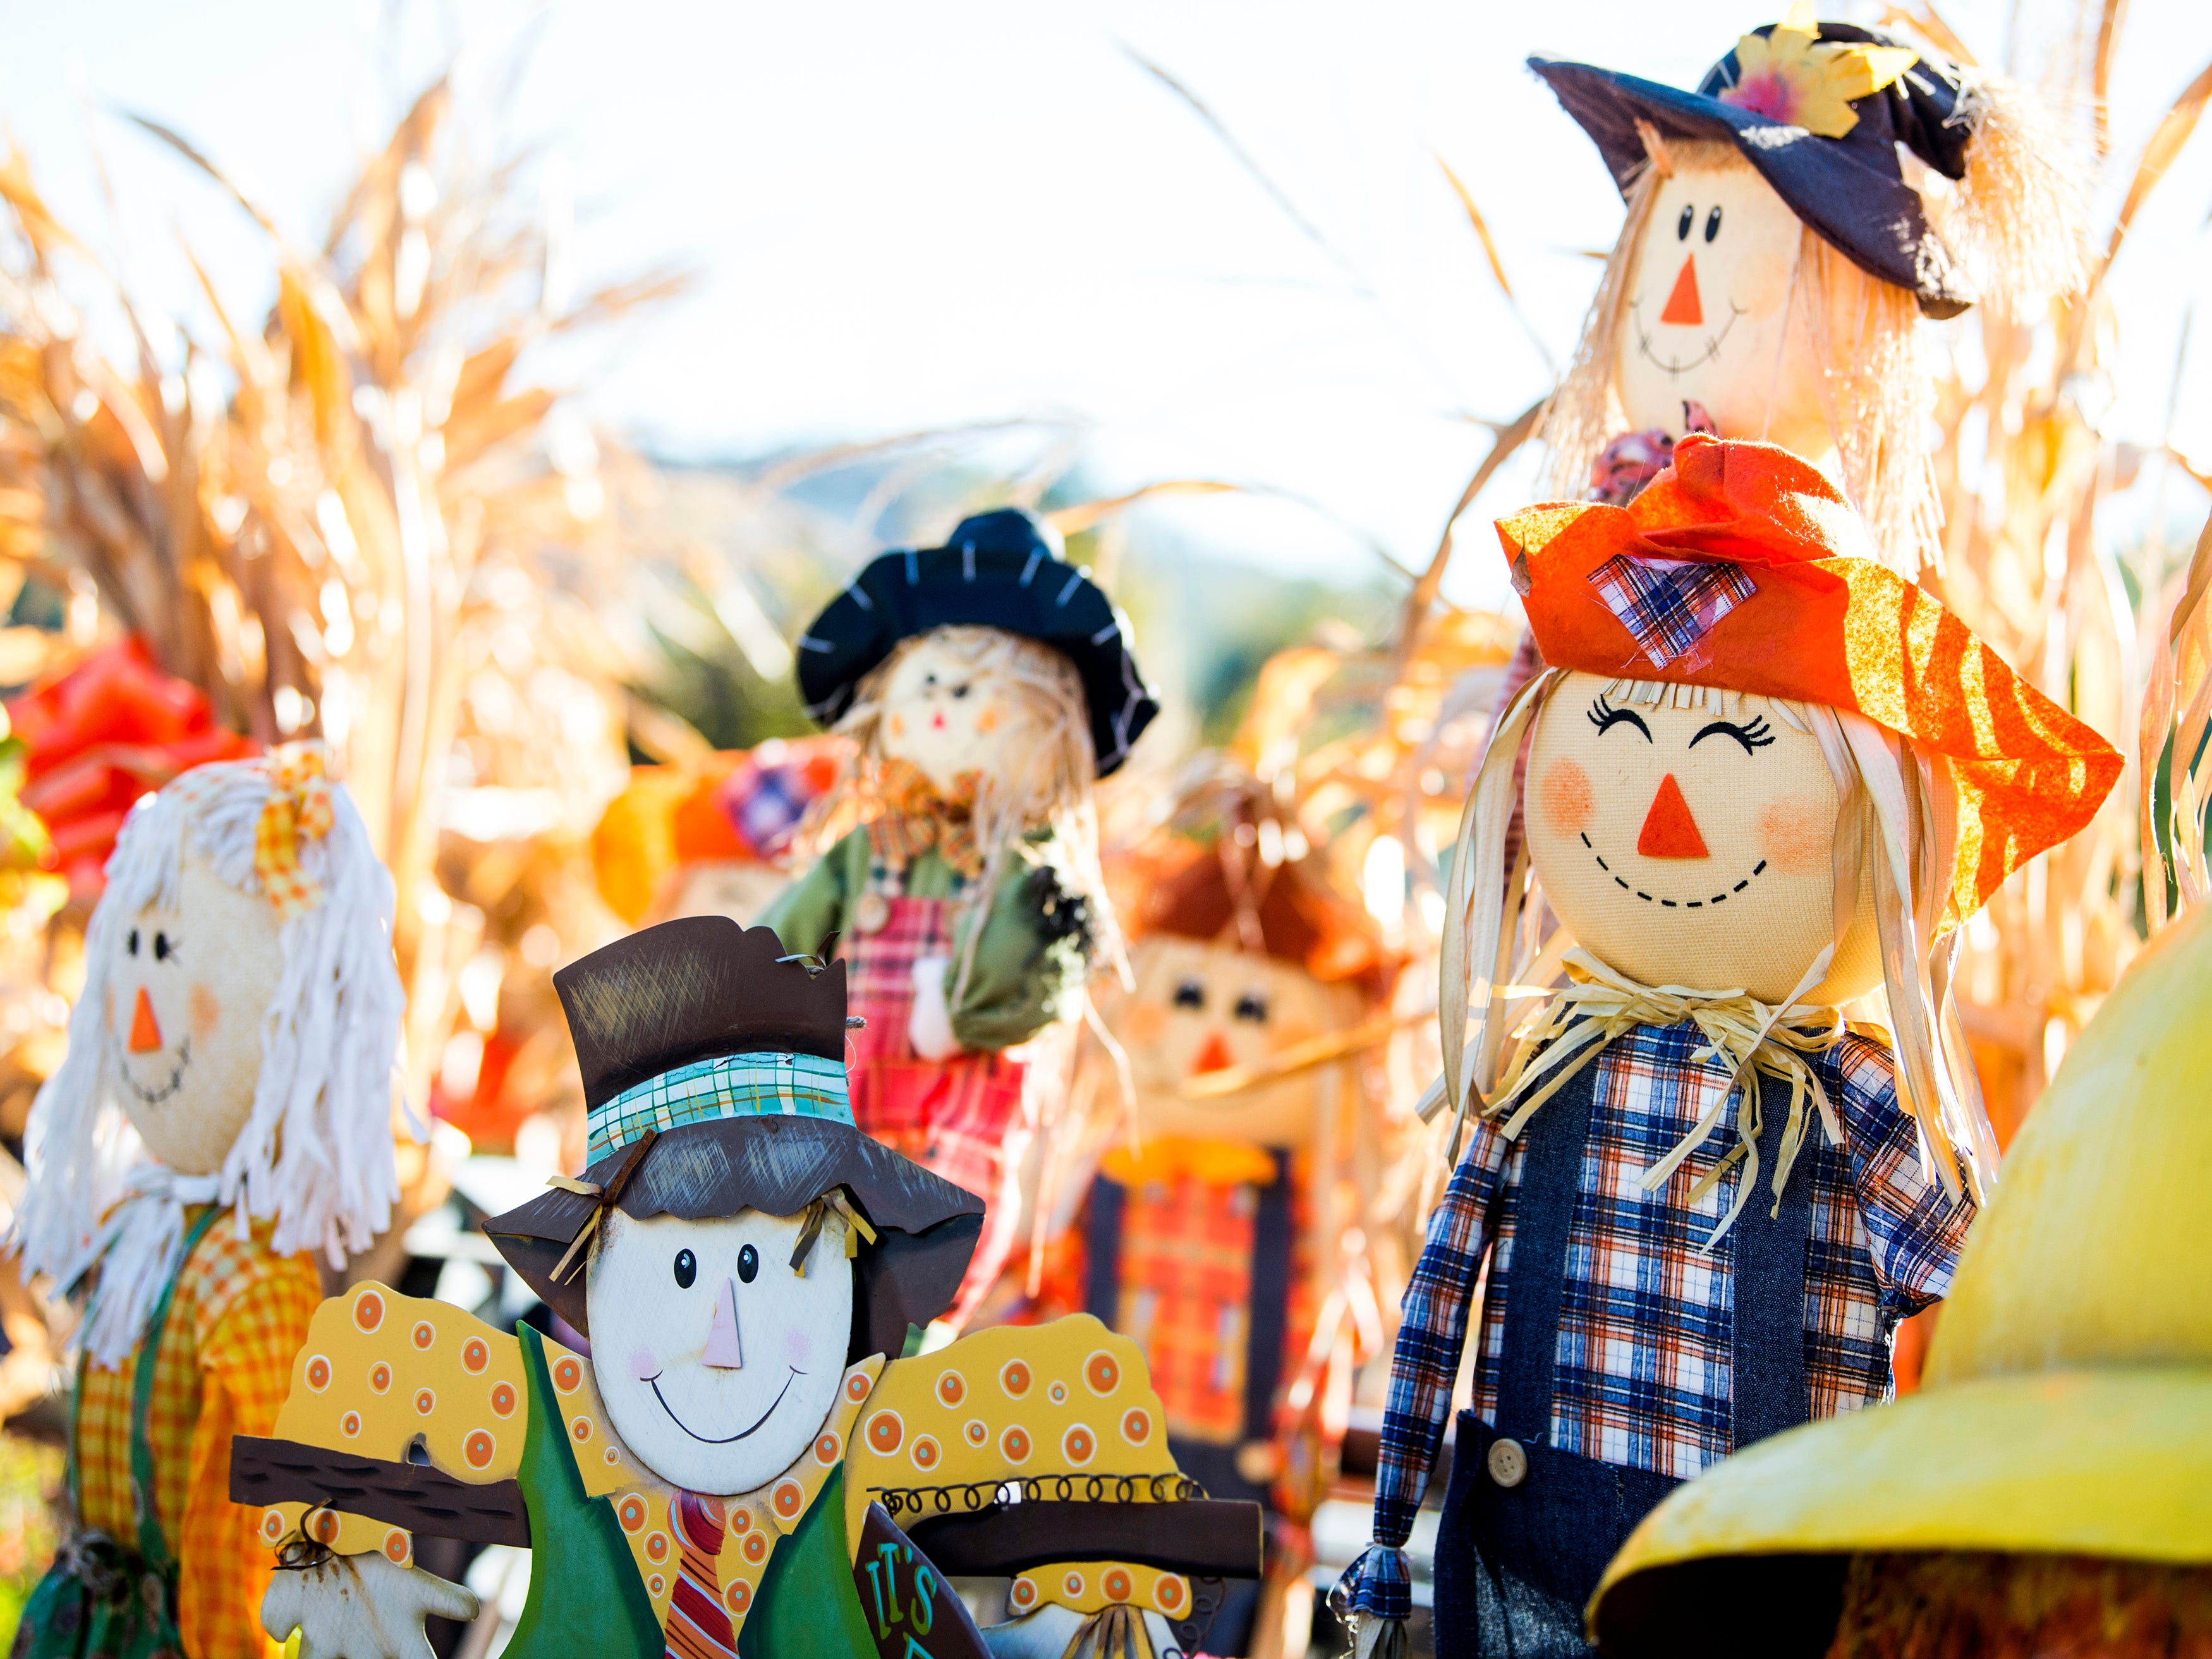 Gatlinburg tries to break world record with 4,325 scarecrows